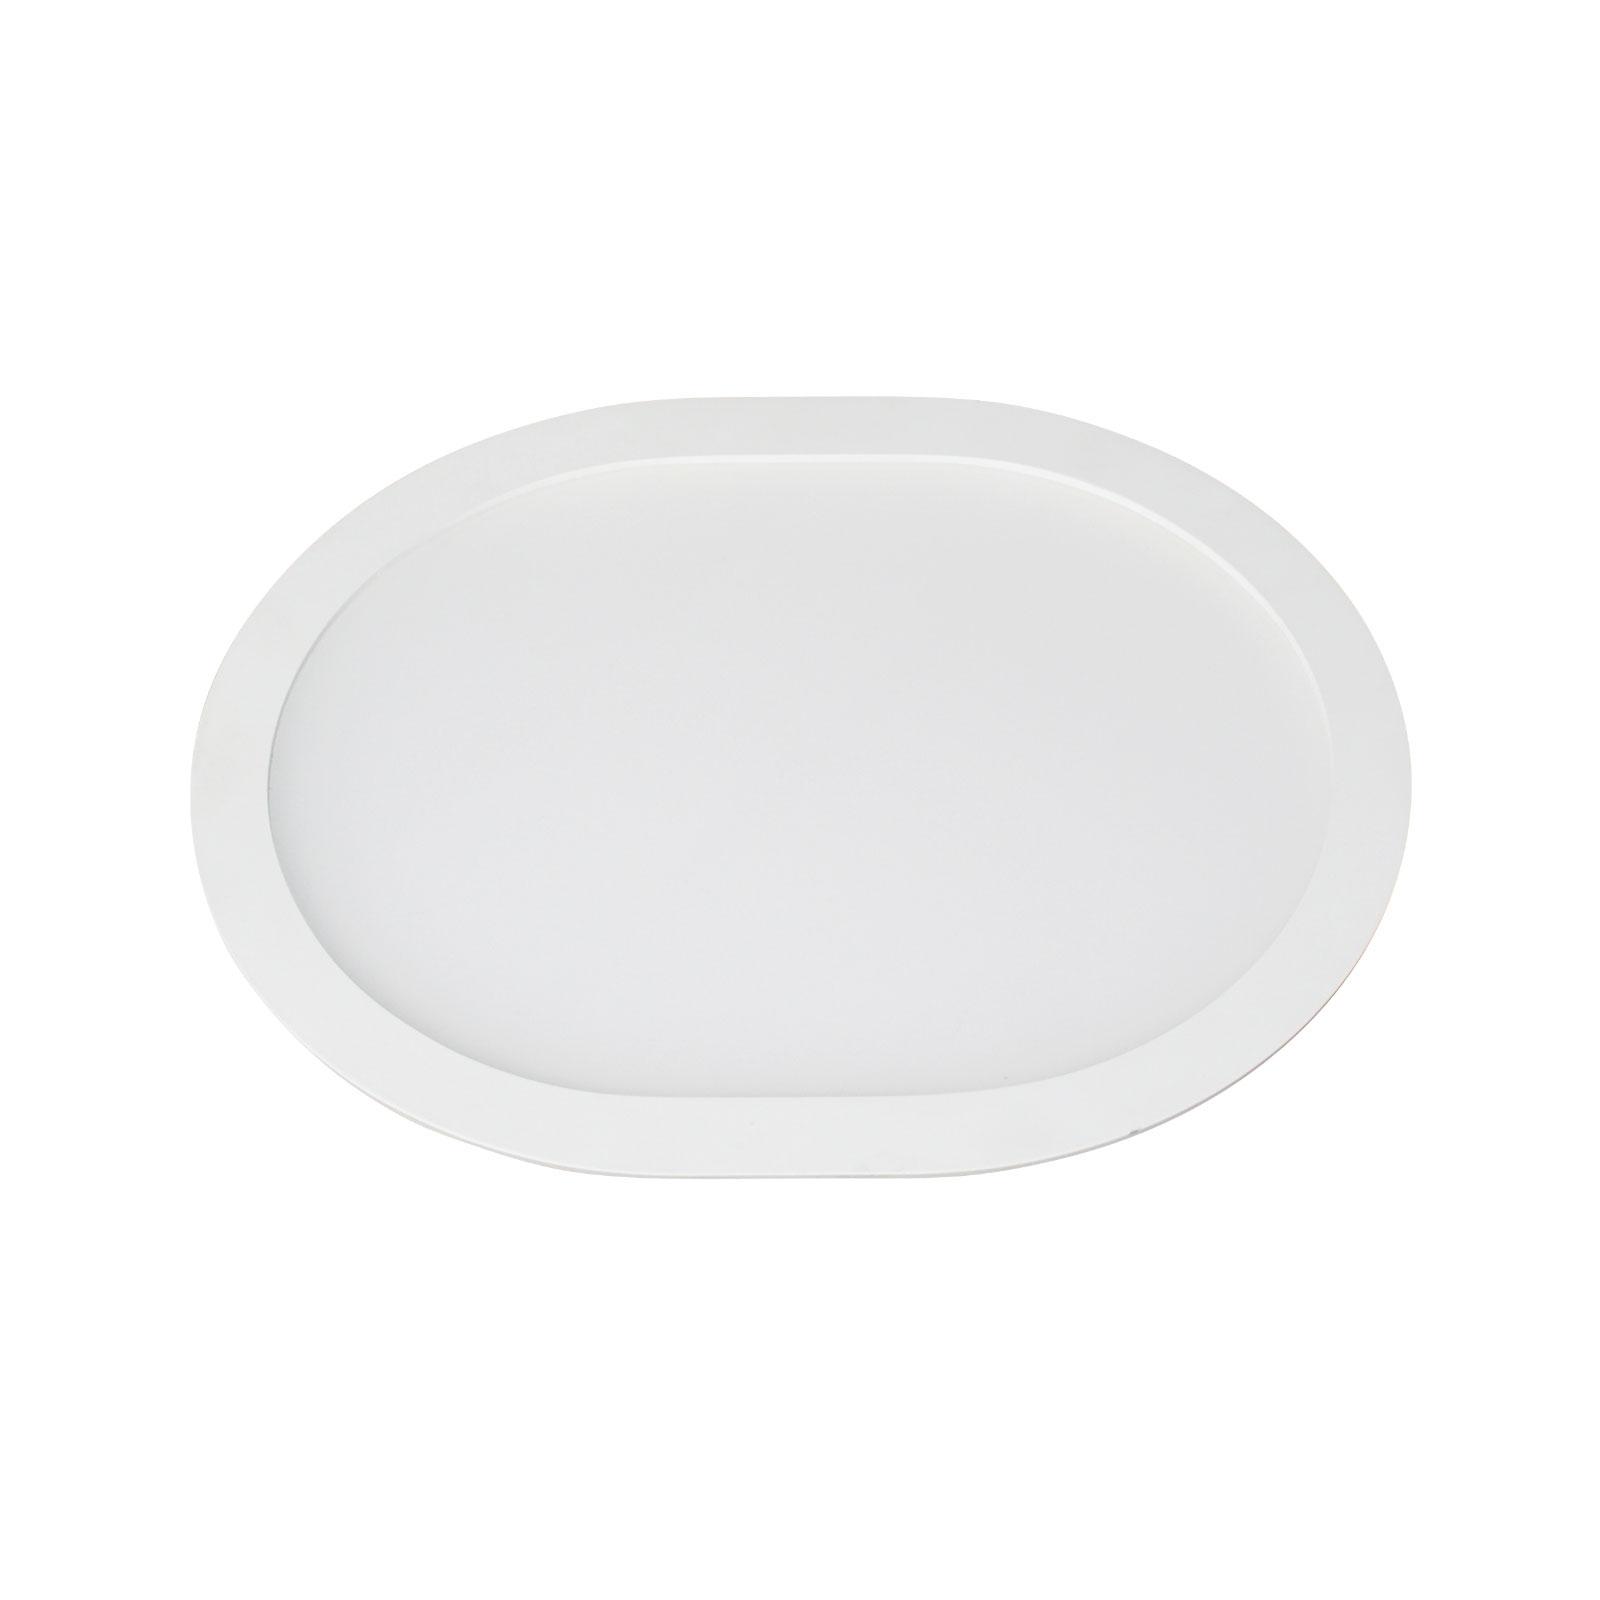 LED-uppopaneeli Ovale, 4 500 K, 18 cm x 15 cm